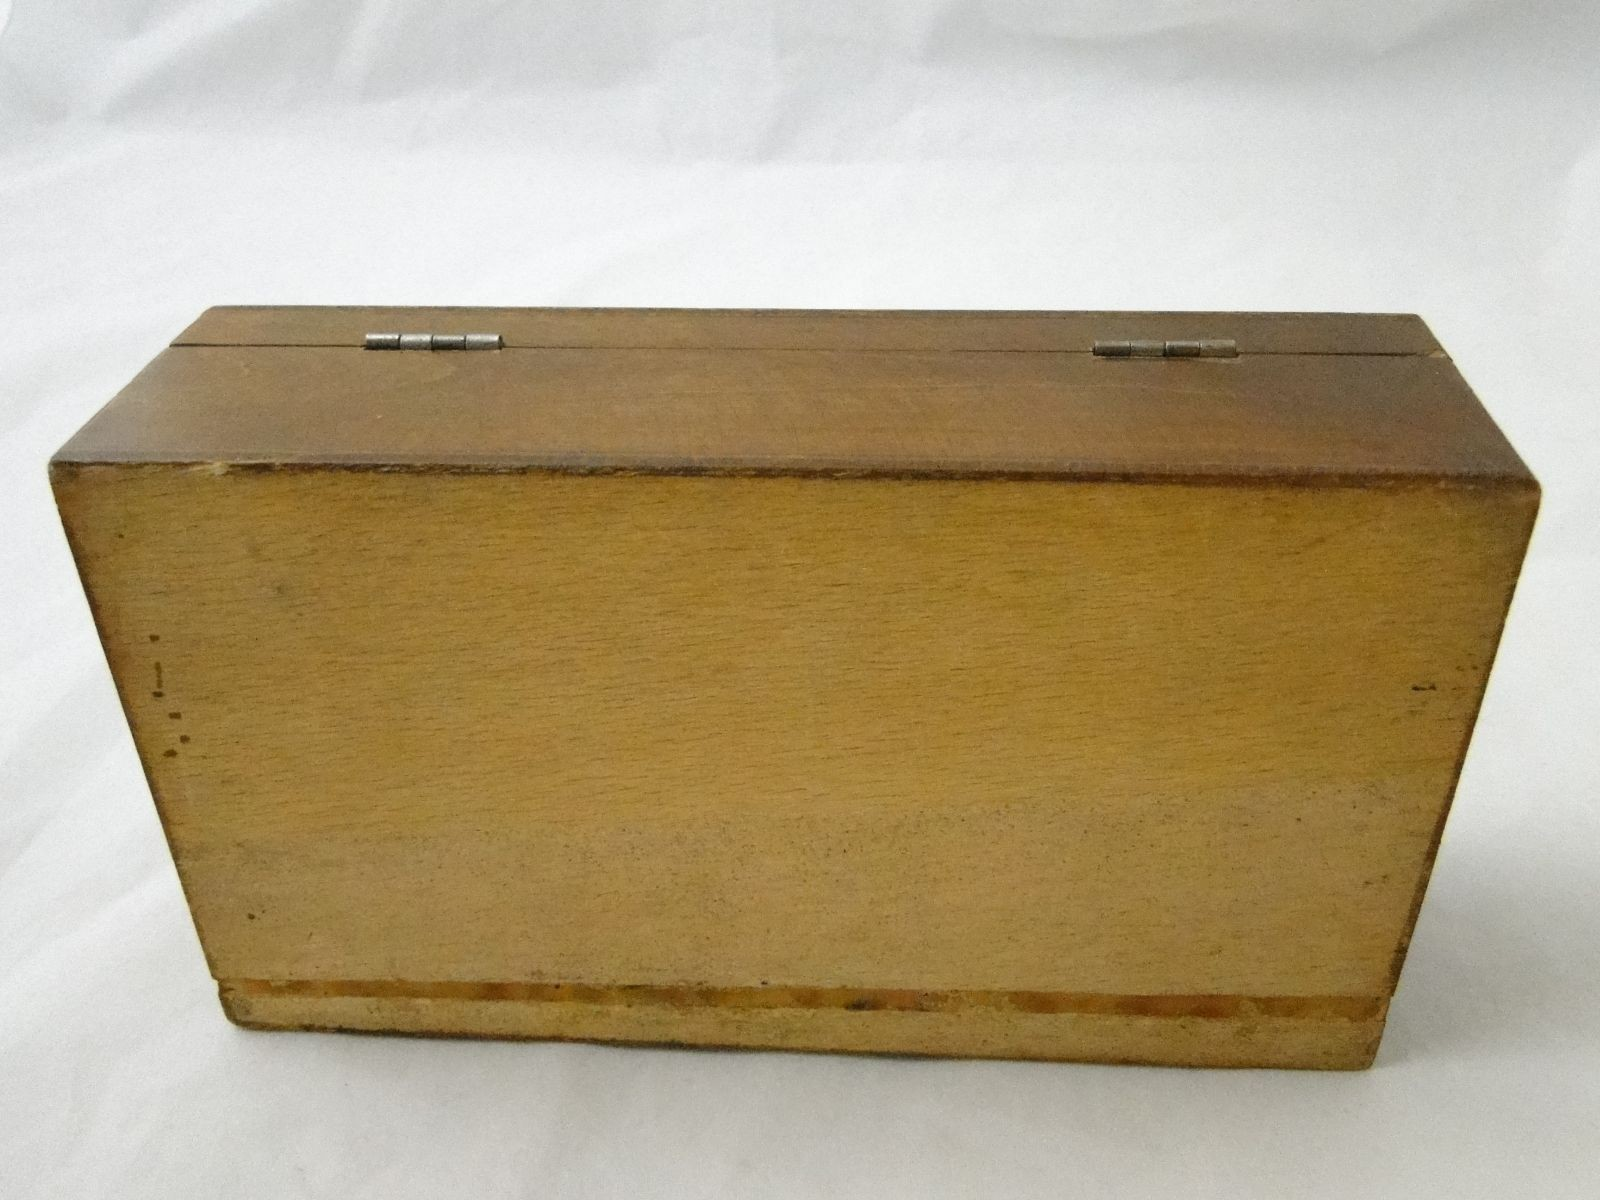 DSC07250.JPG (1600�1200)